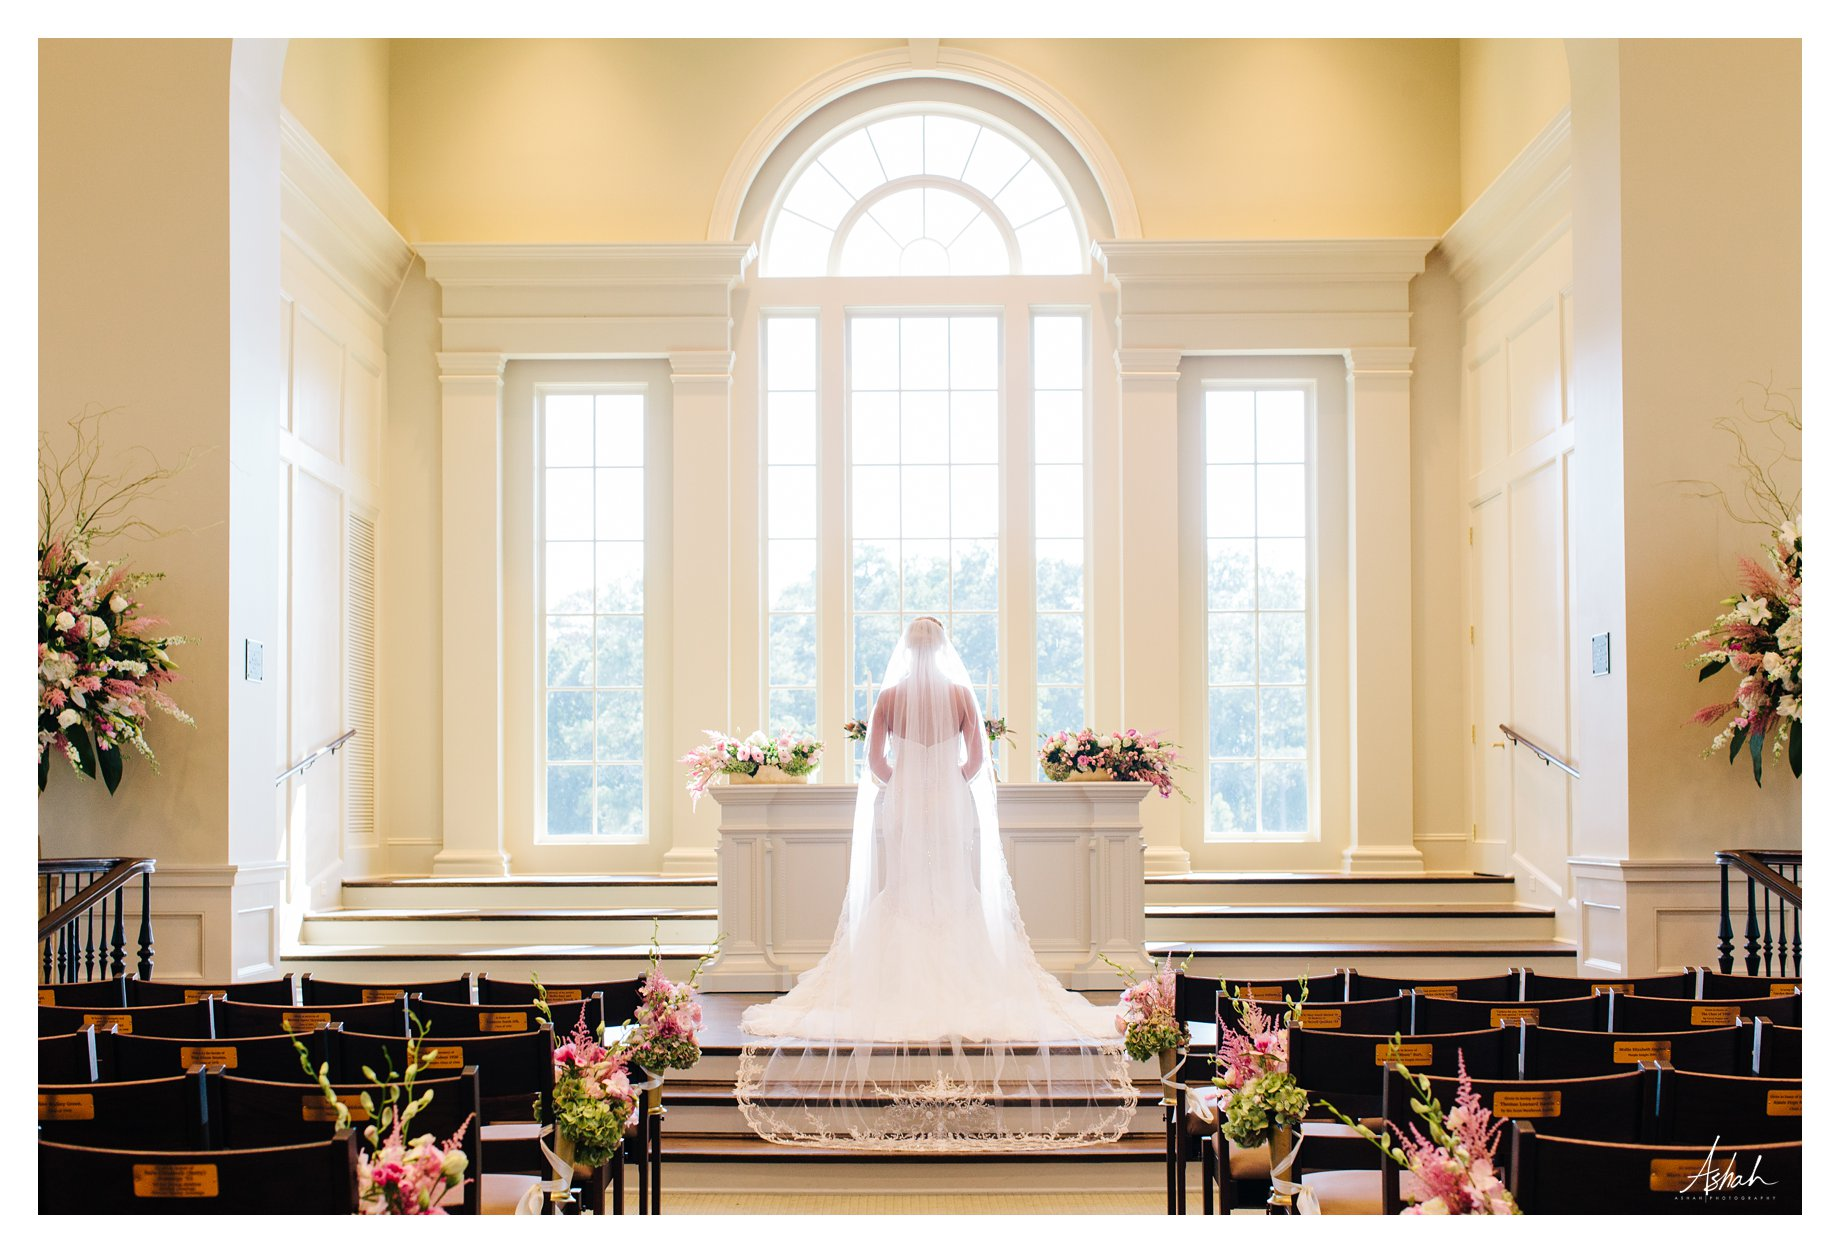 The Bride and Train -- Macon Wedding Photographer